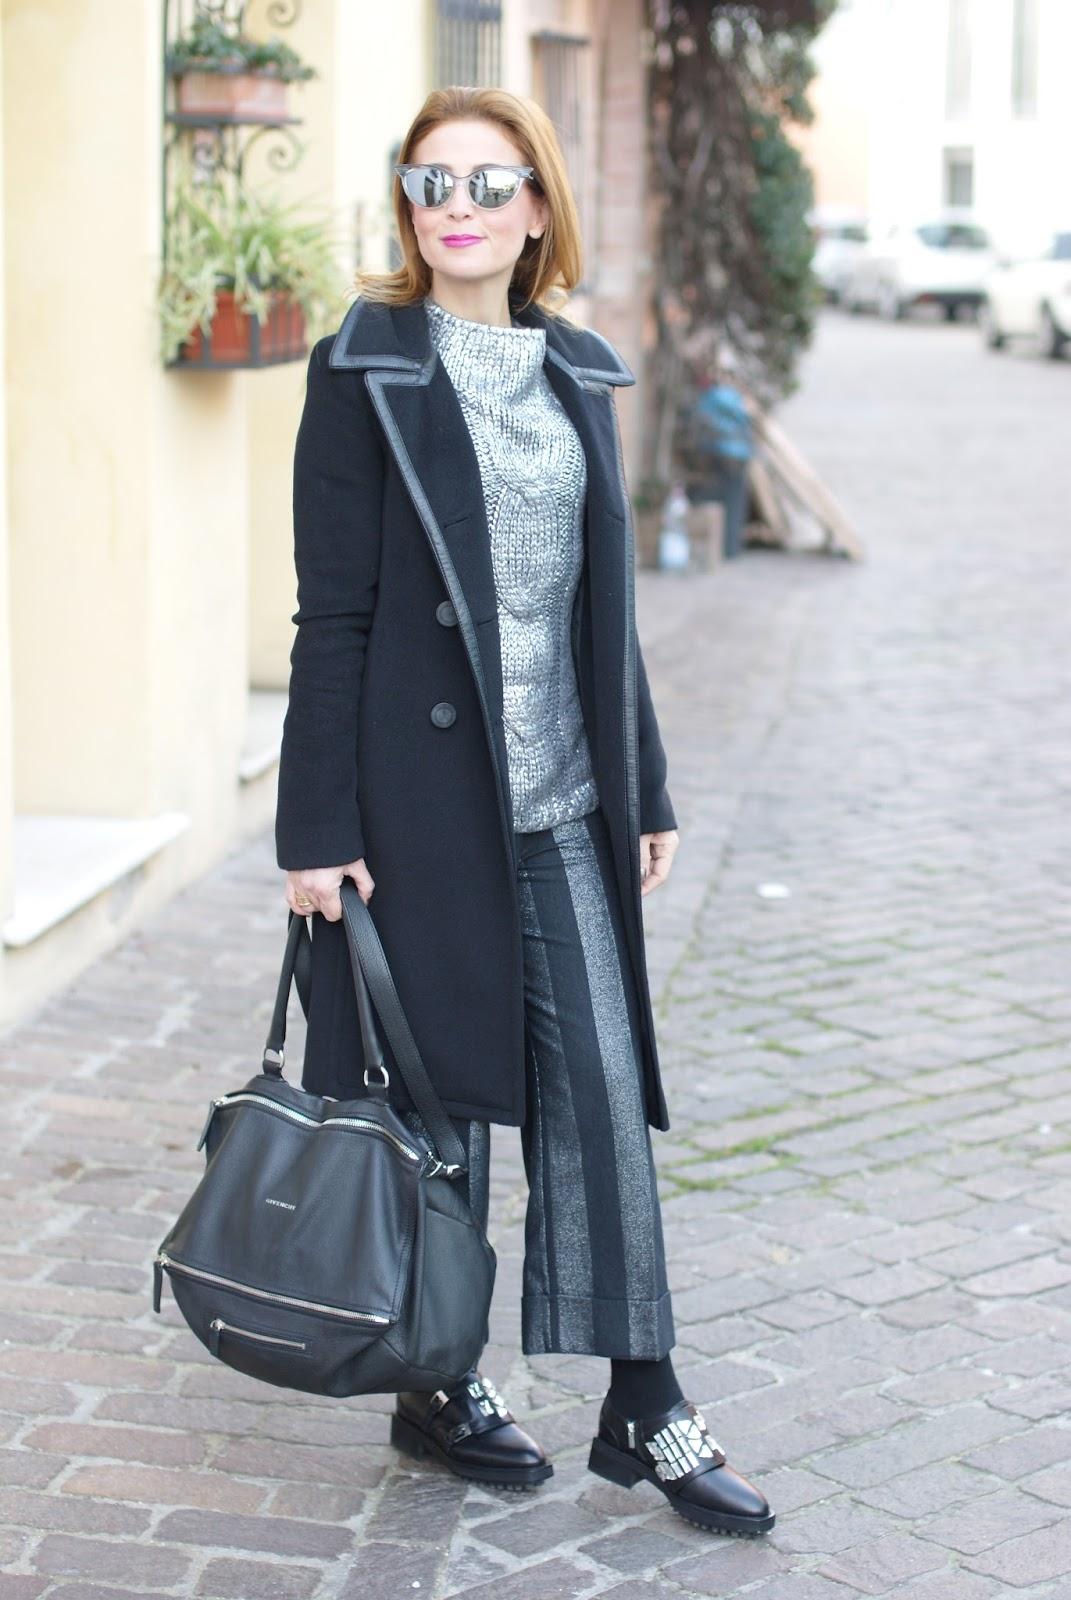 Balenciaga black coat with leather trim and Givenchy Pandora large on Fashion and Cookies fashion blog, fashion blogger style